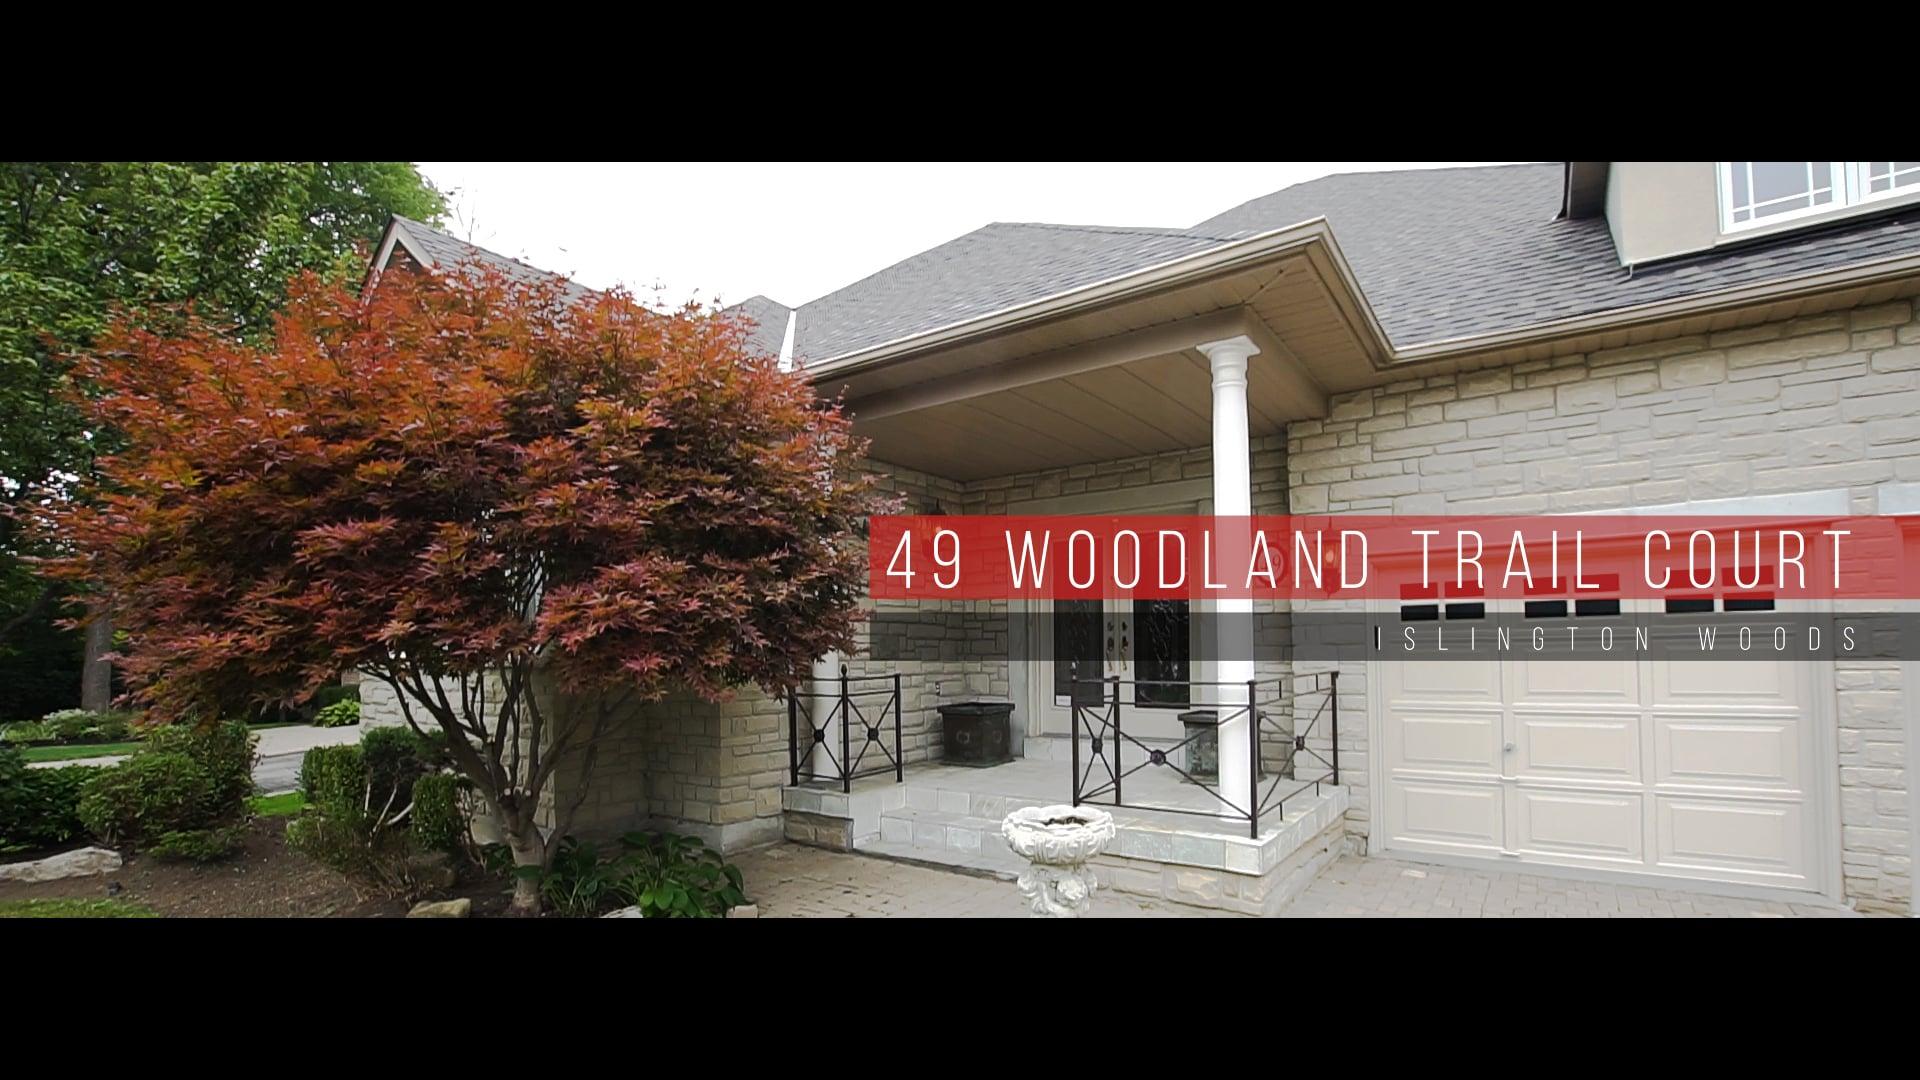 49 Woodland Trail Court